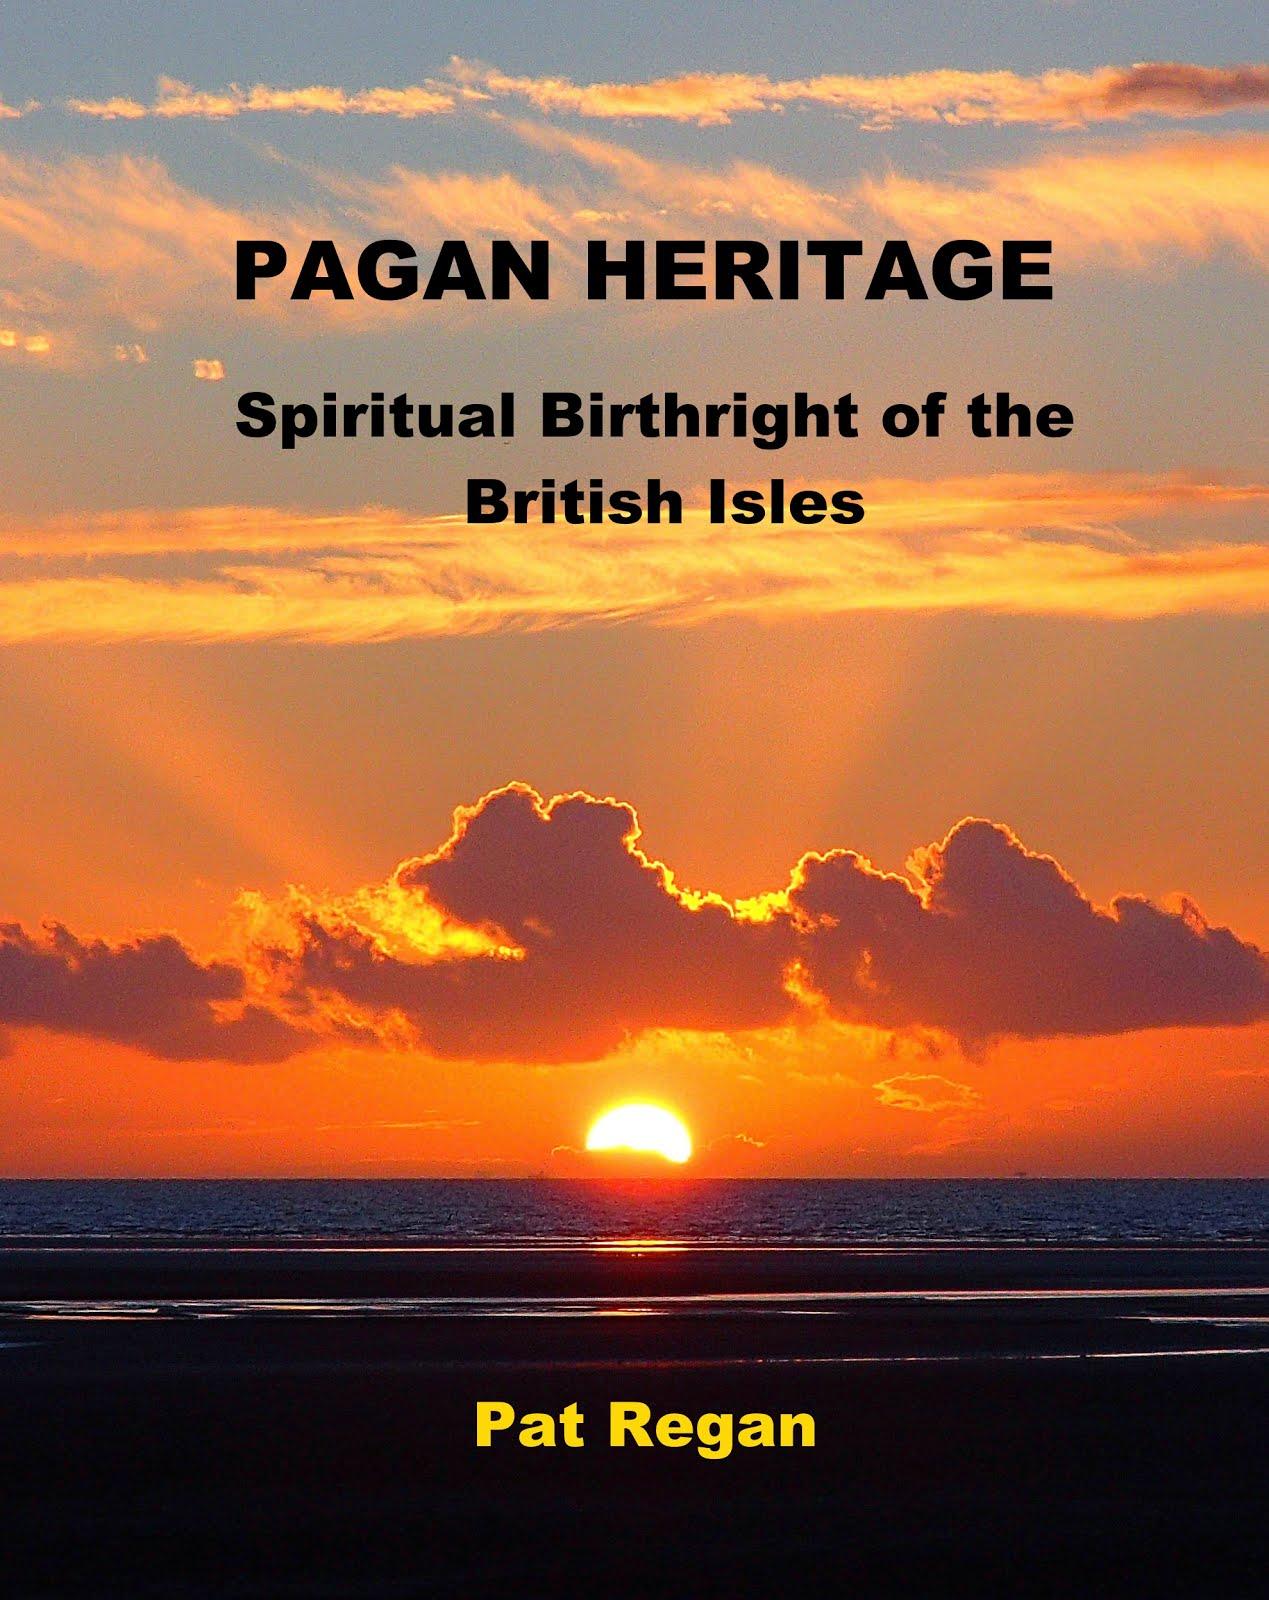 Pagan Heritage